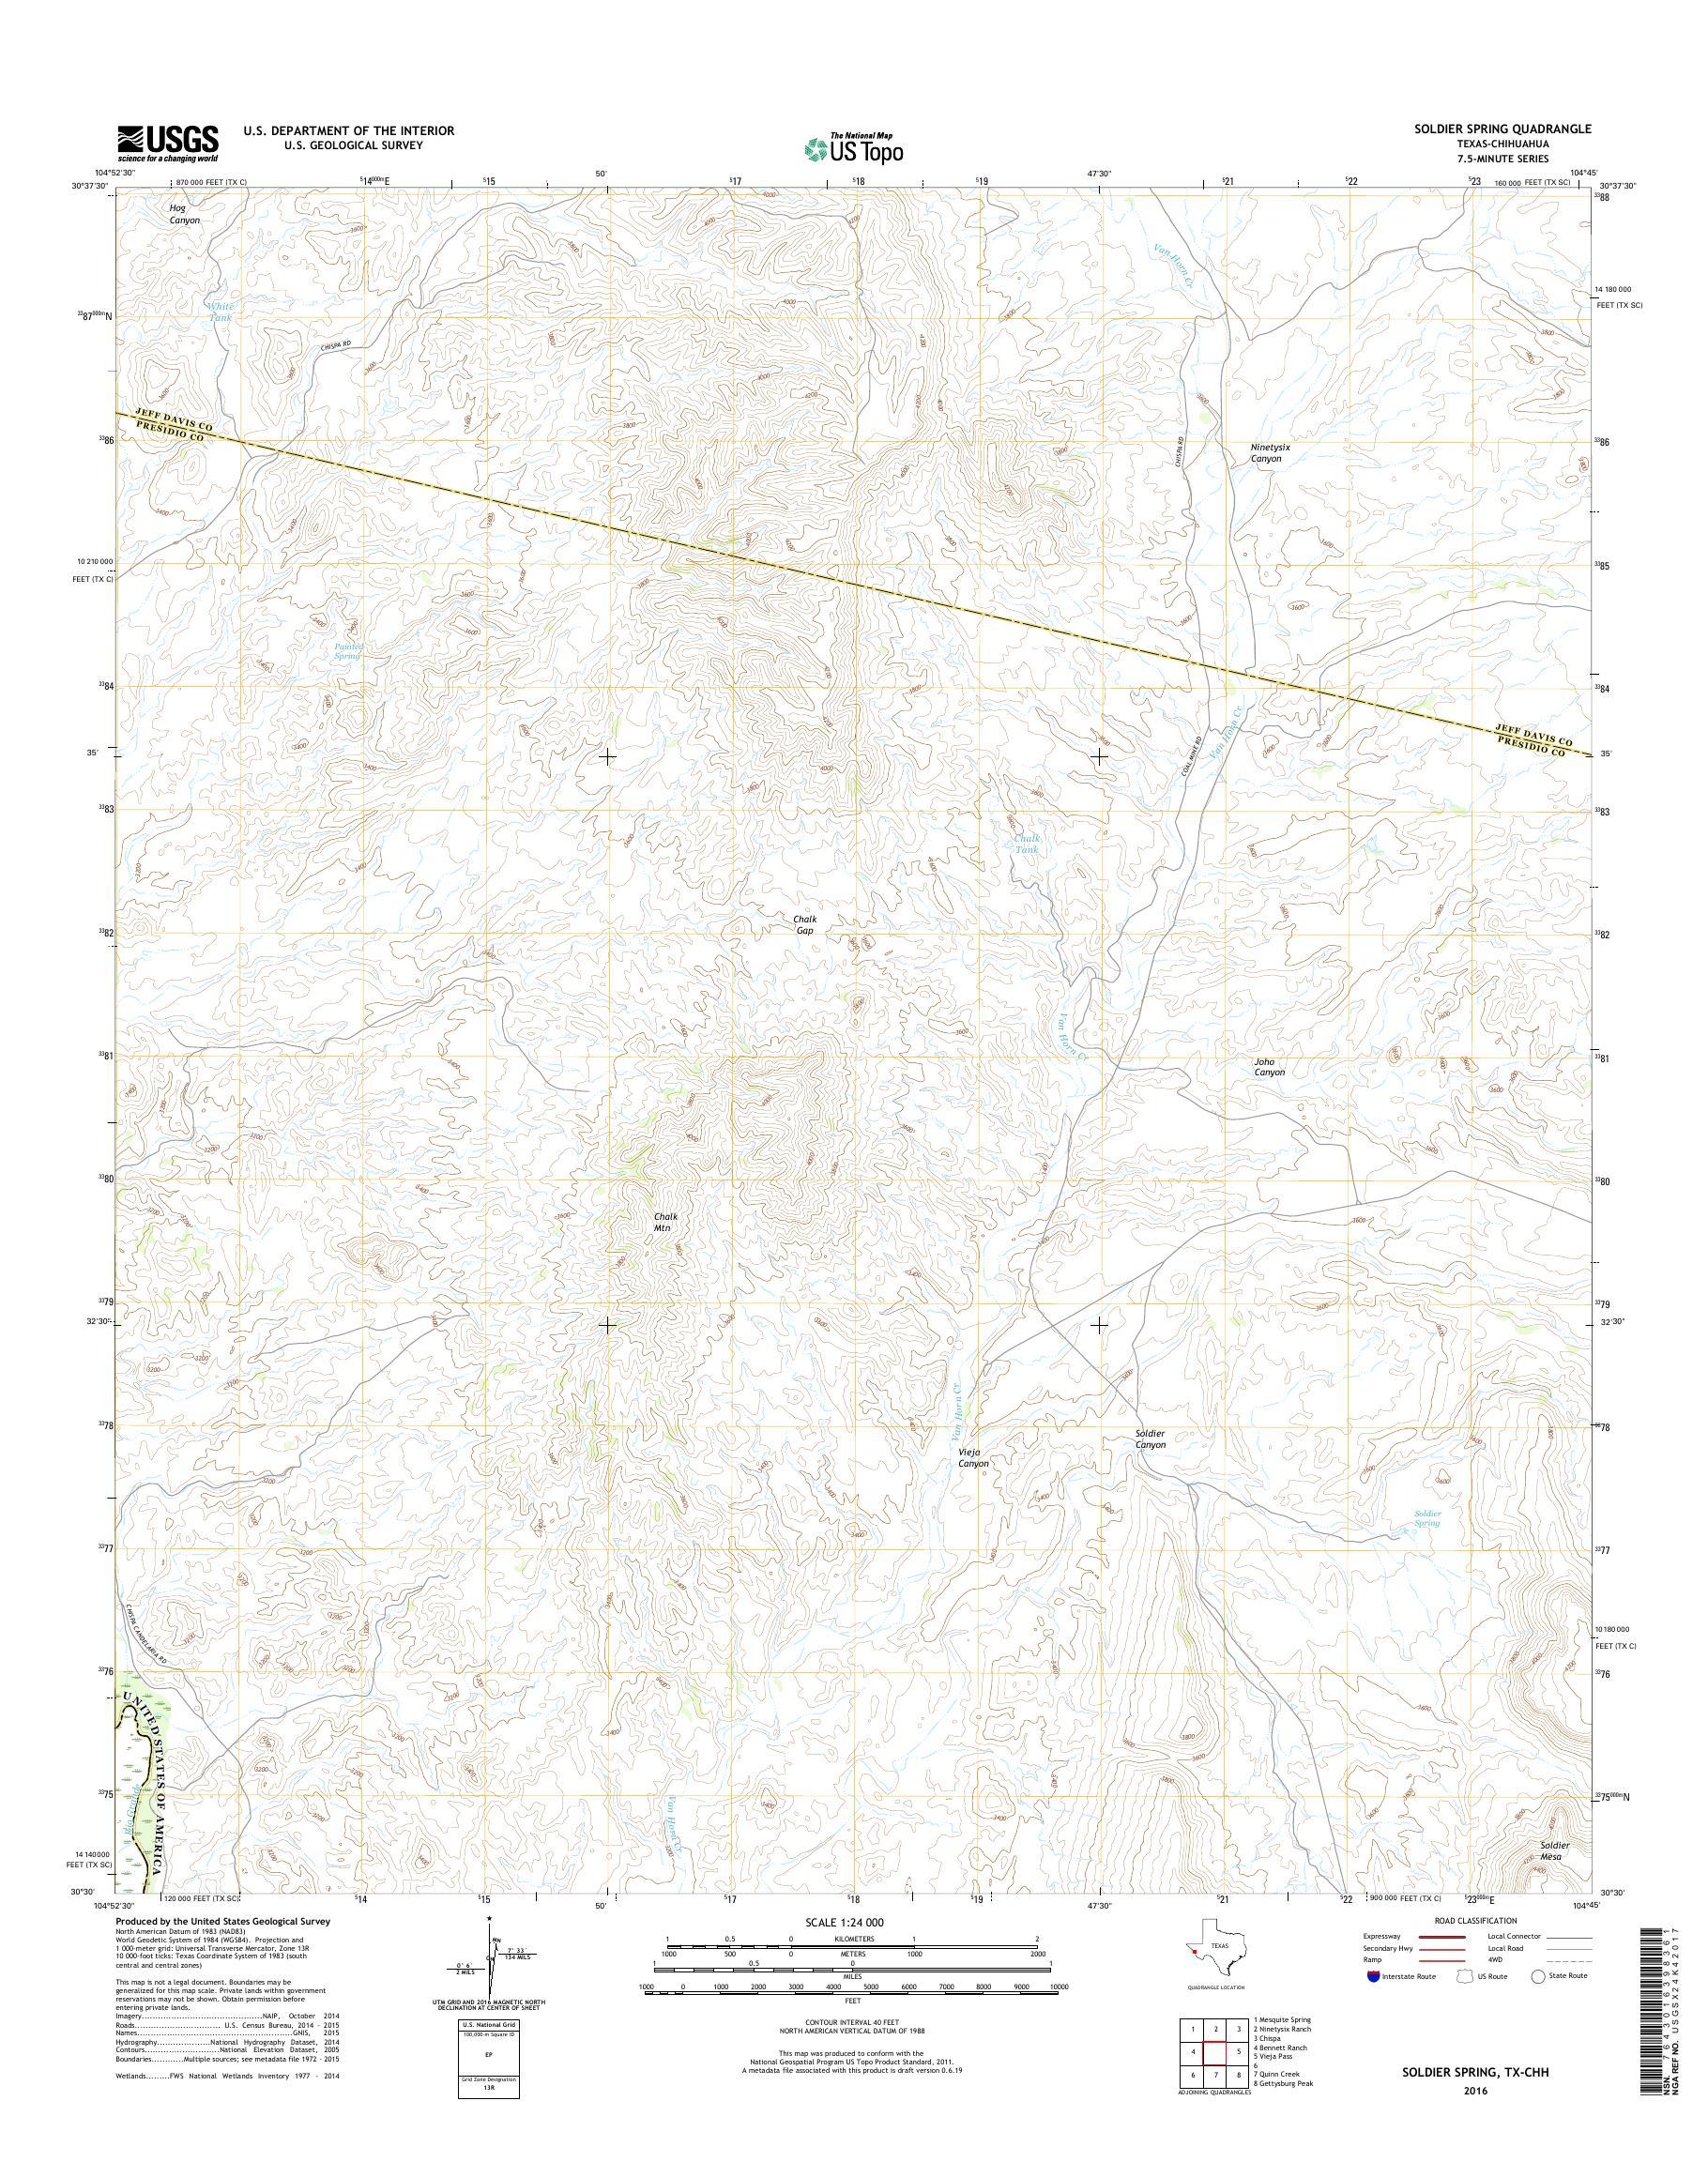 Mytopo Soldier Spring Texas Usgs Quad Topo Map